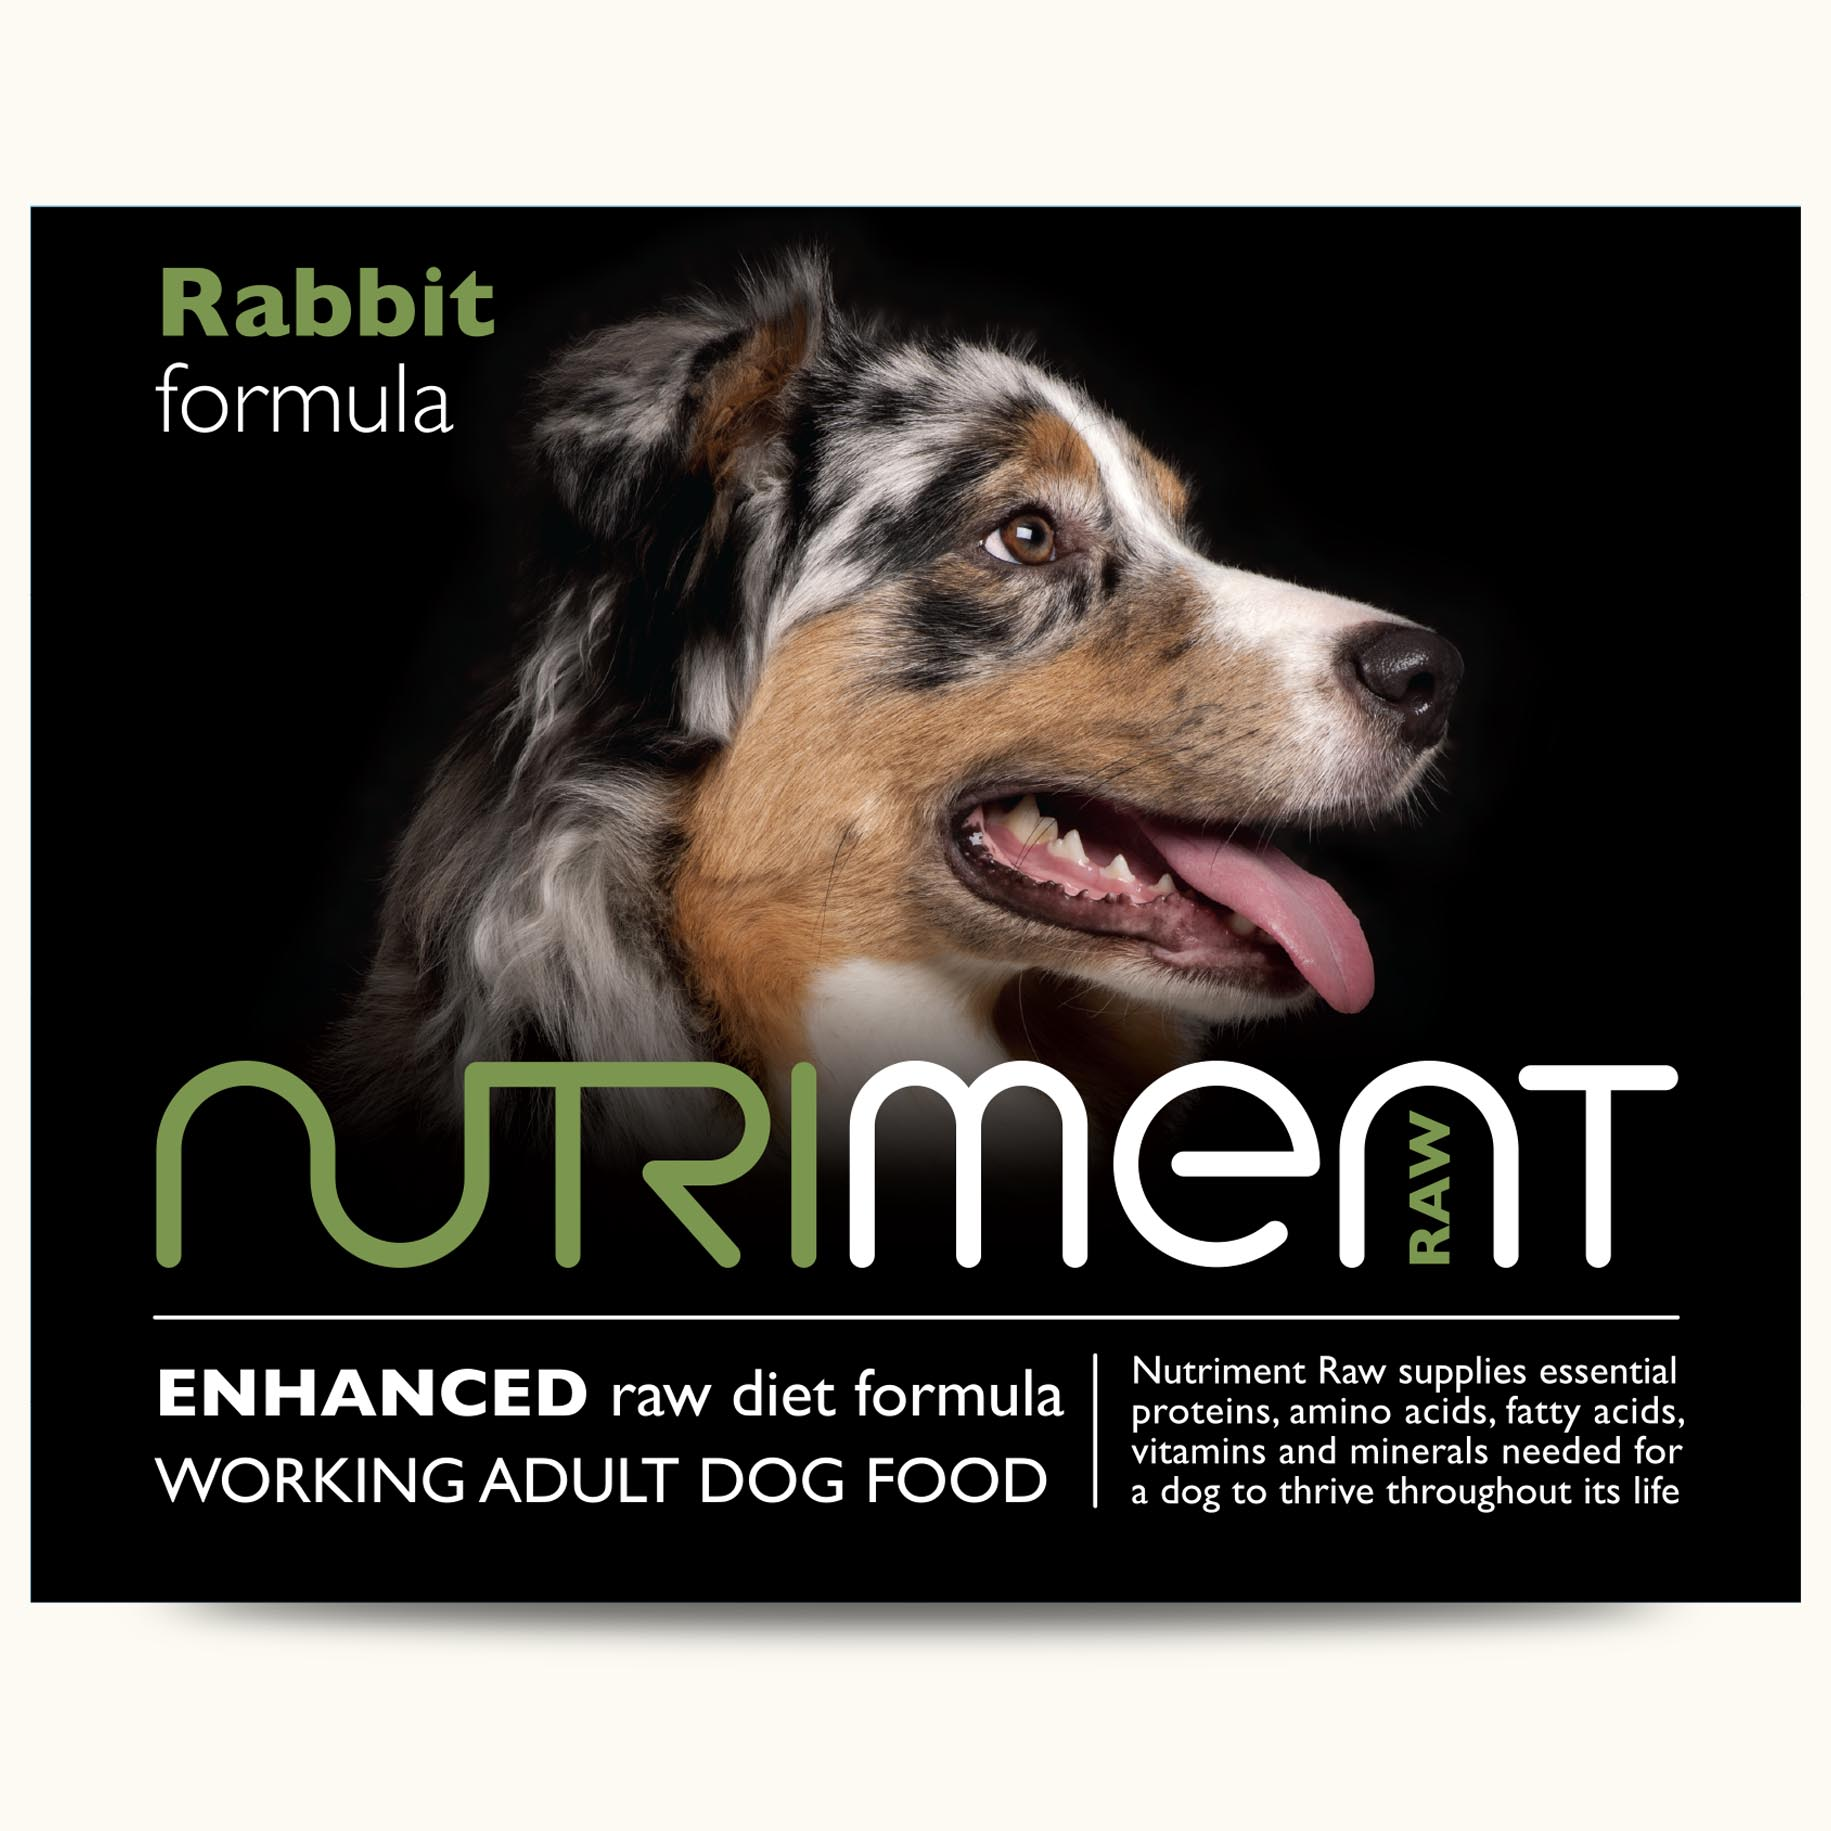 nut-rabbit